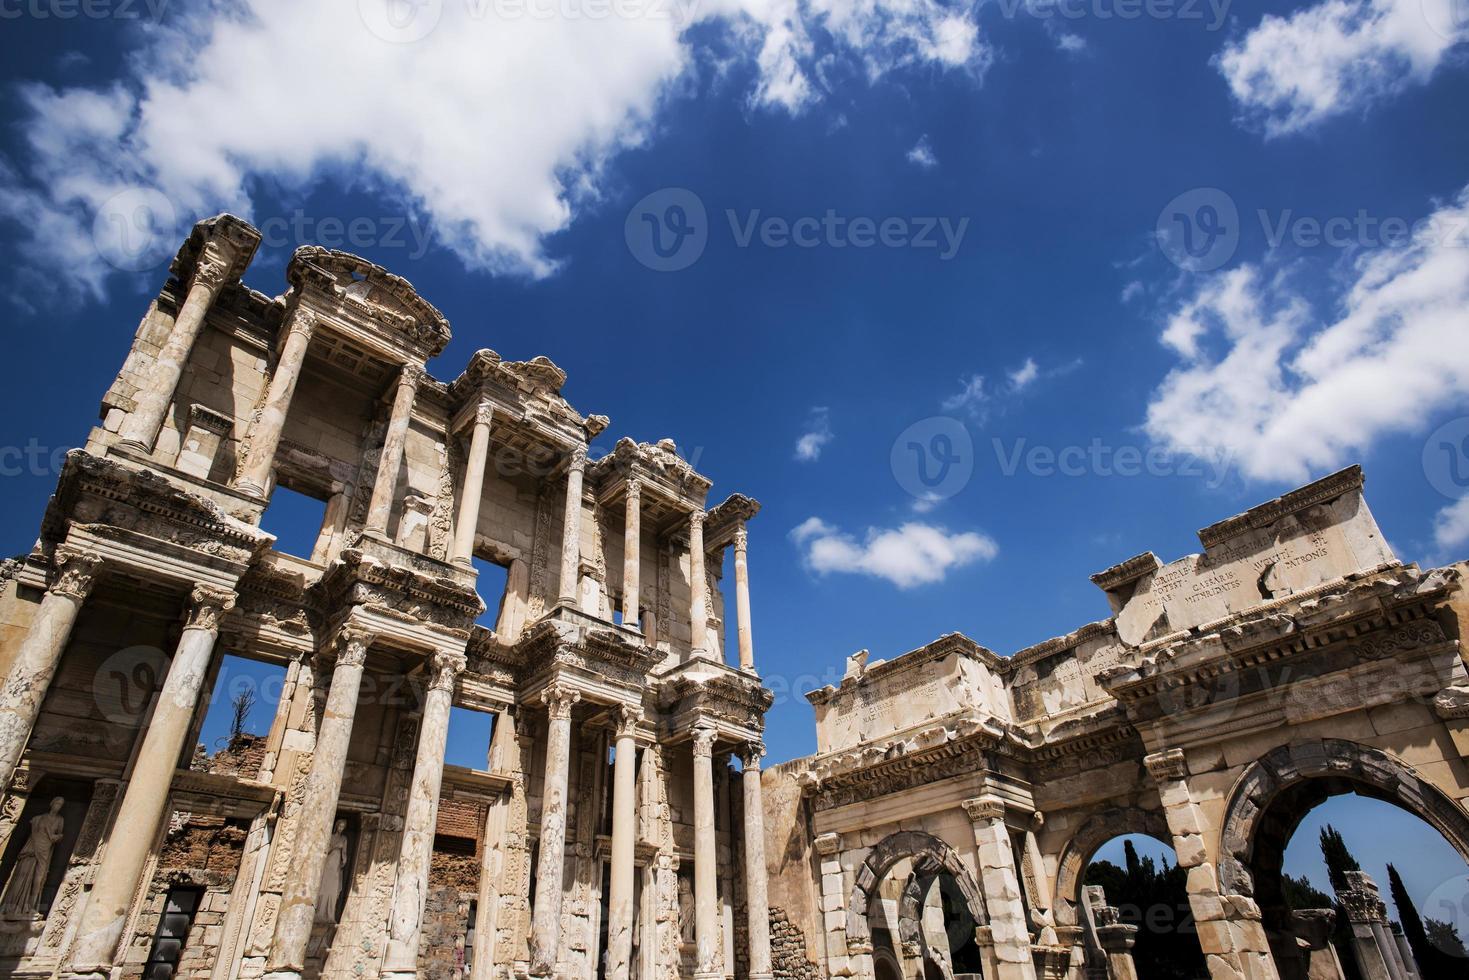 Celsus-Bibliothek im Ephesus-Museum, Türkei foto